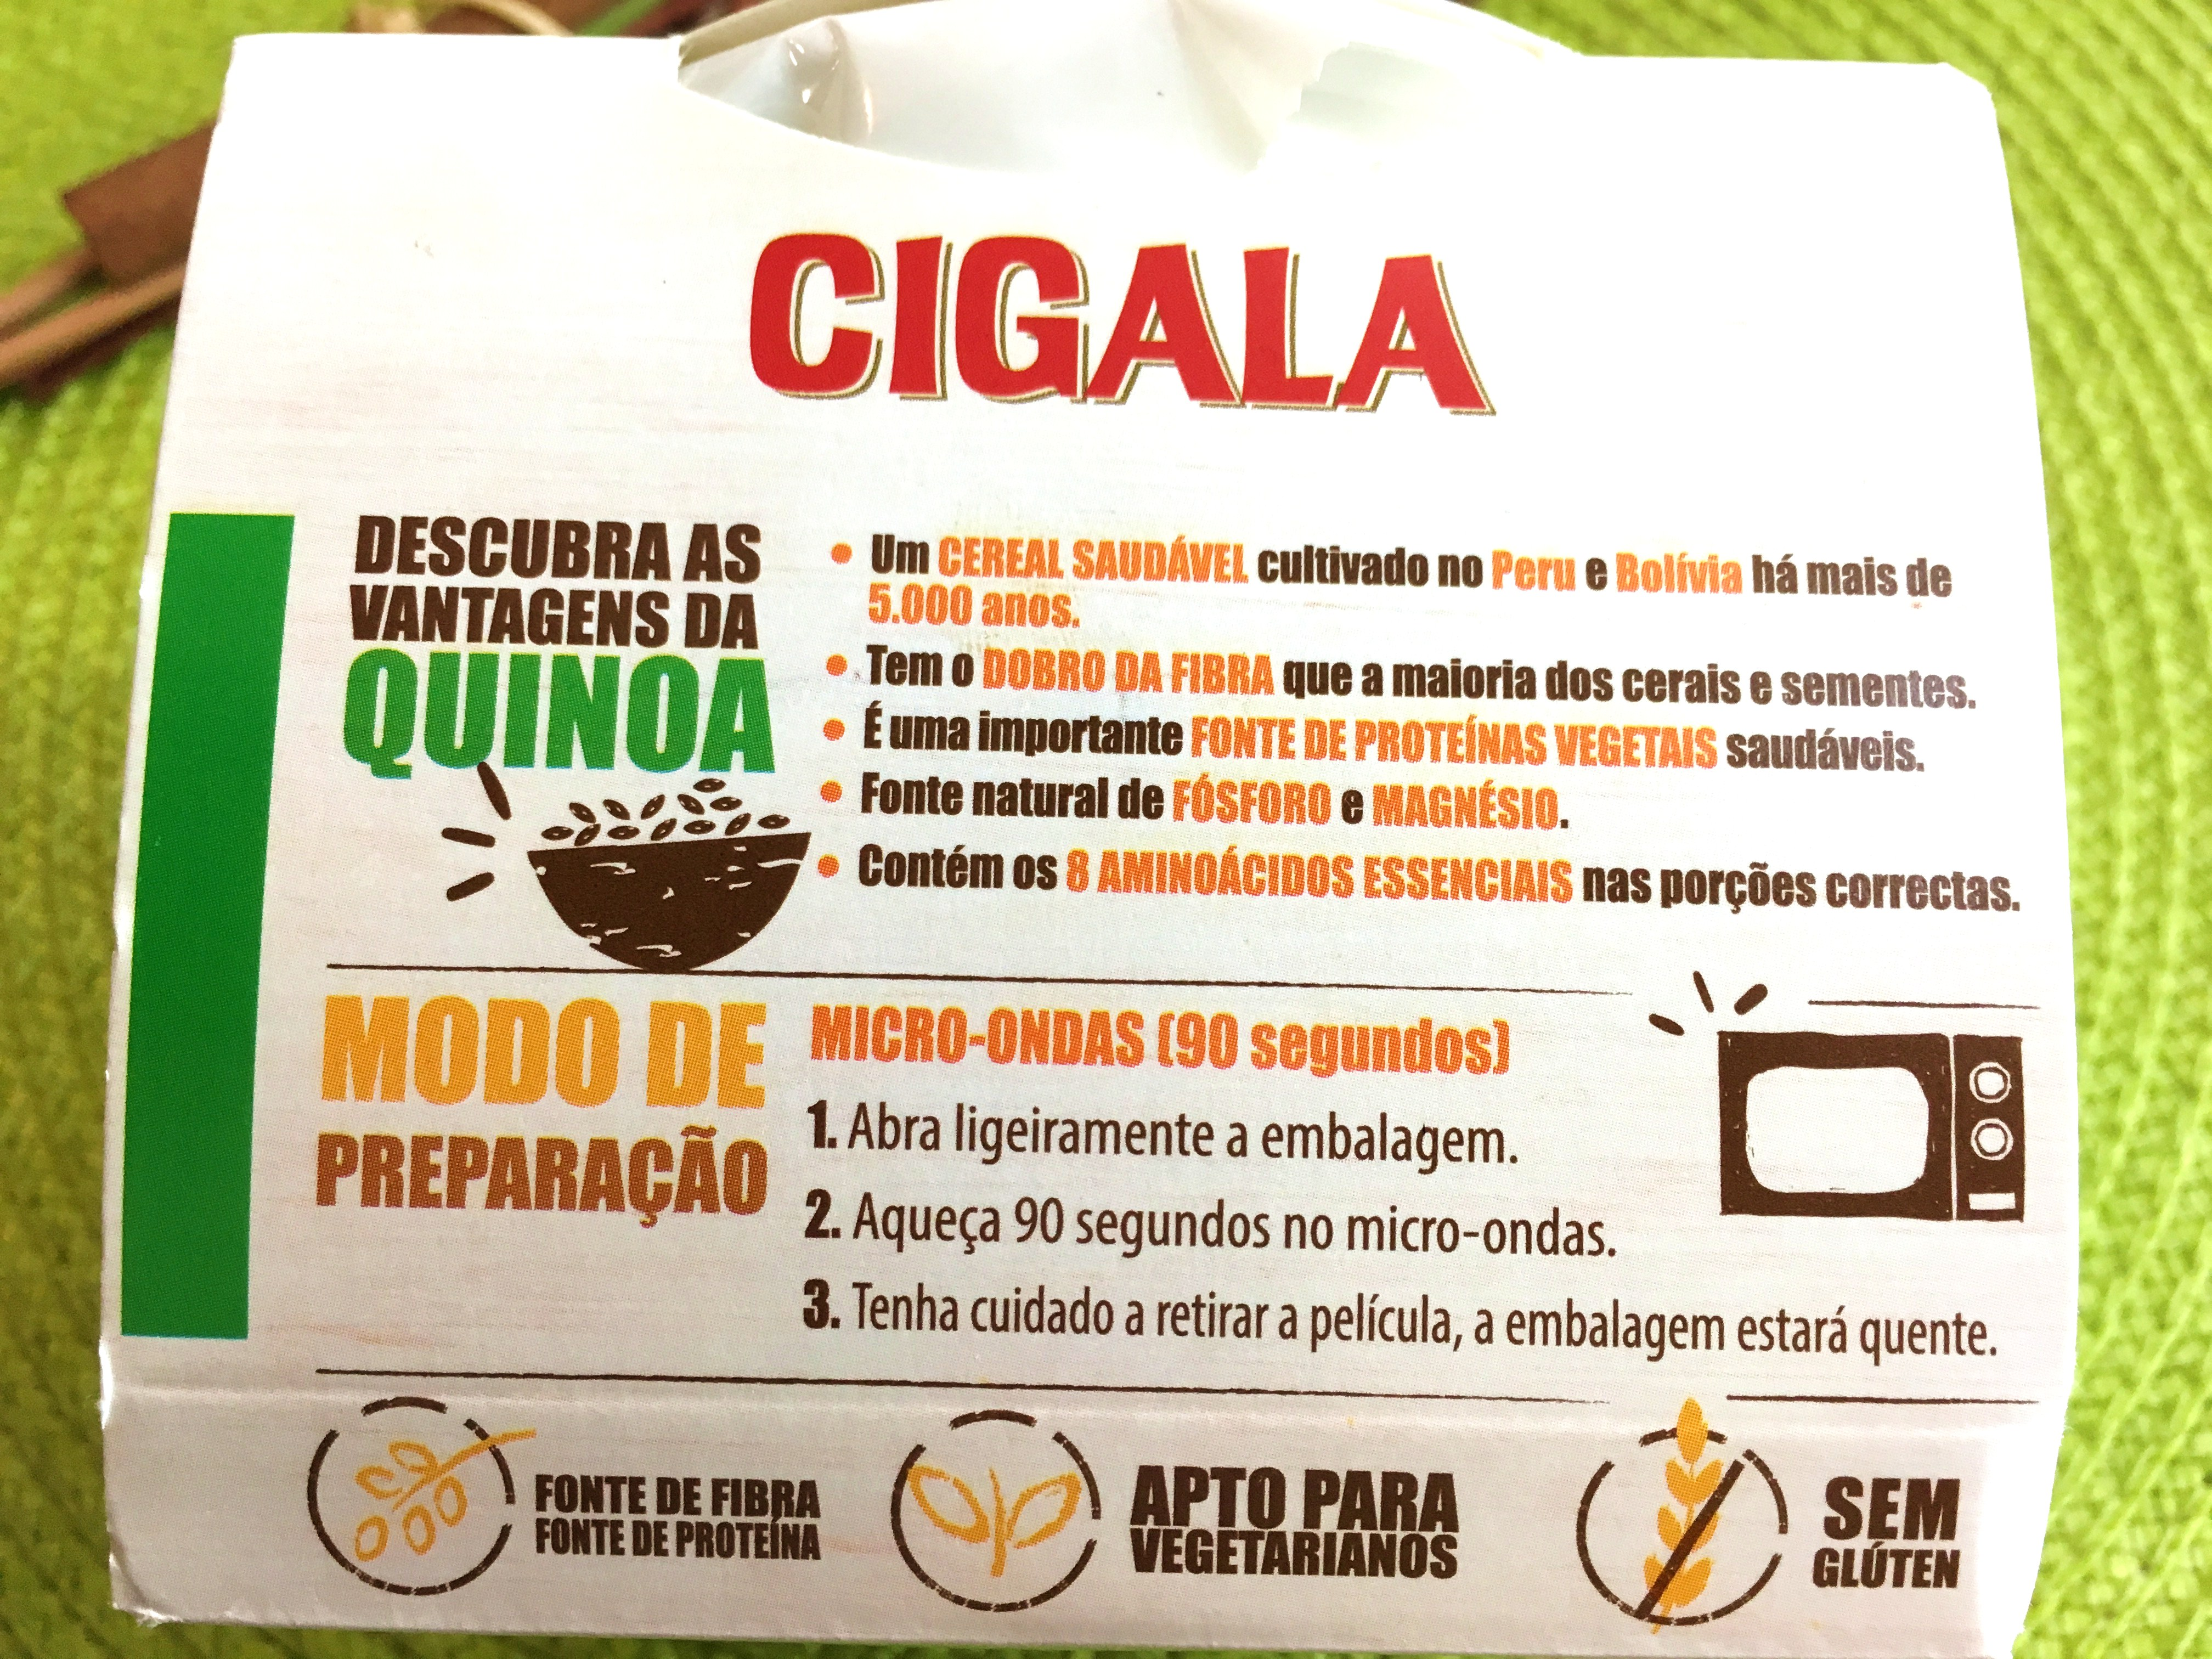 cigala benefit